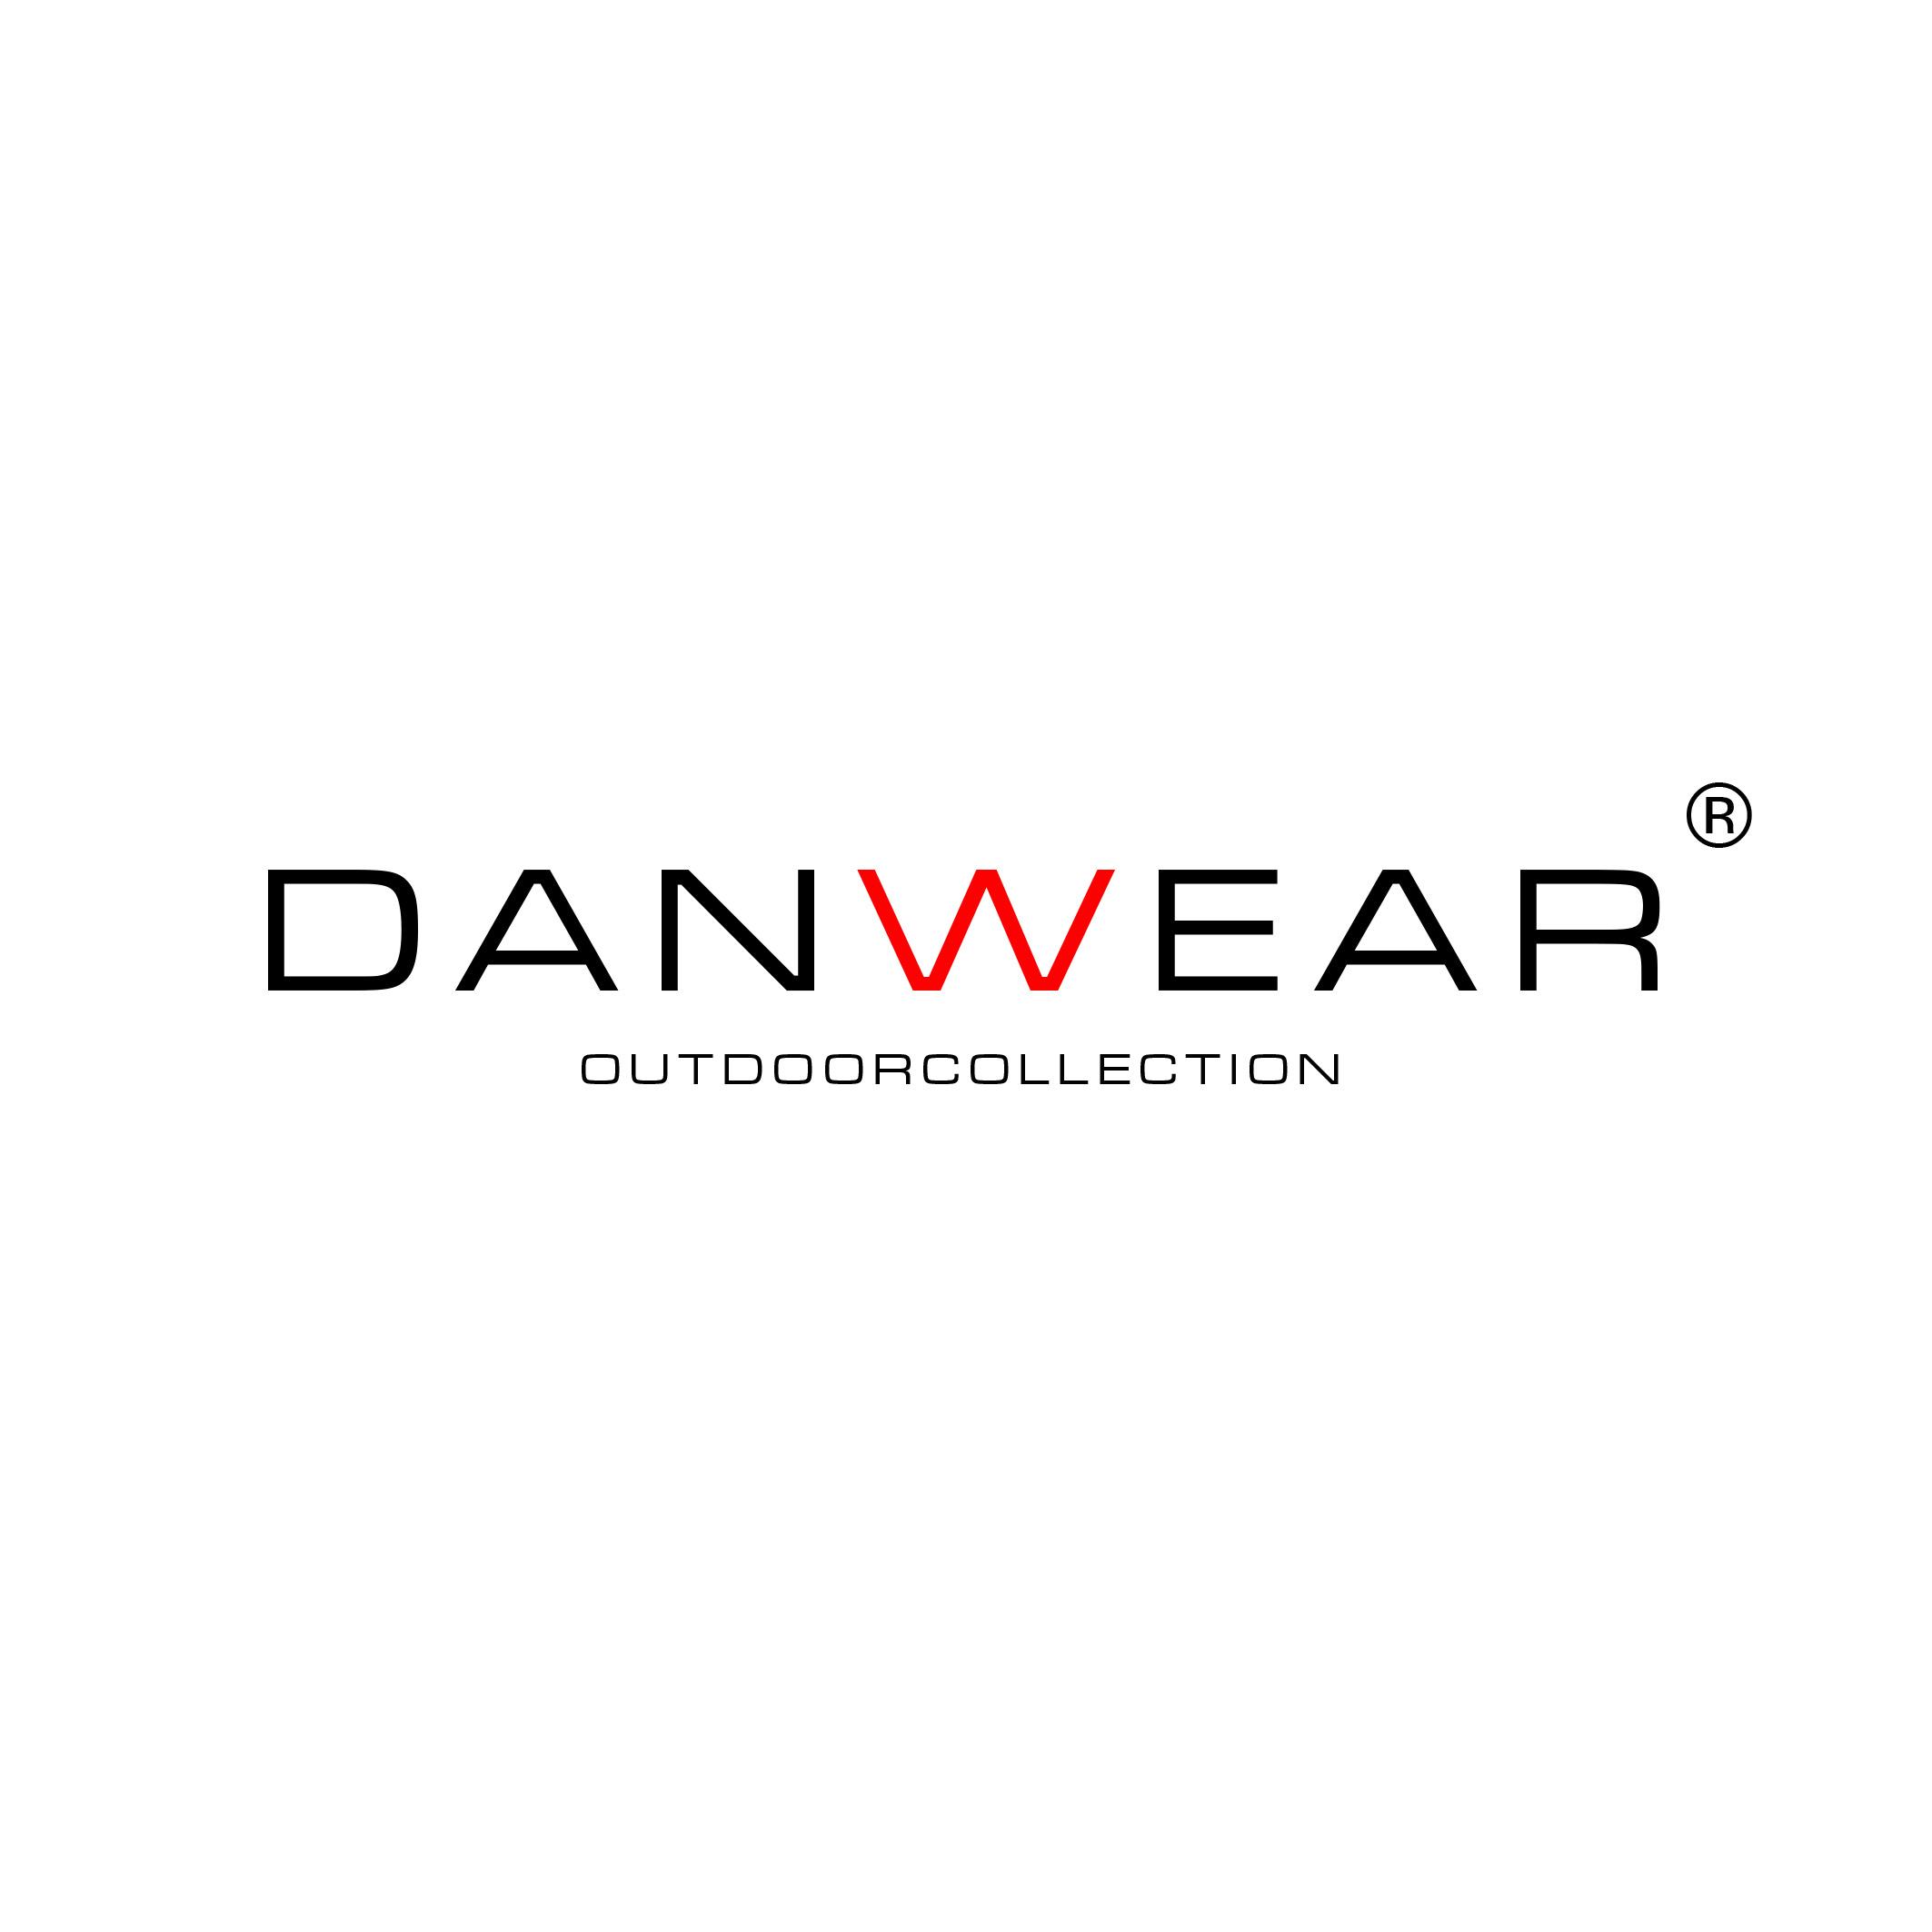 Danwear logokopie